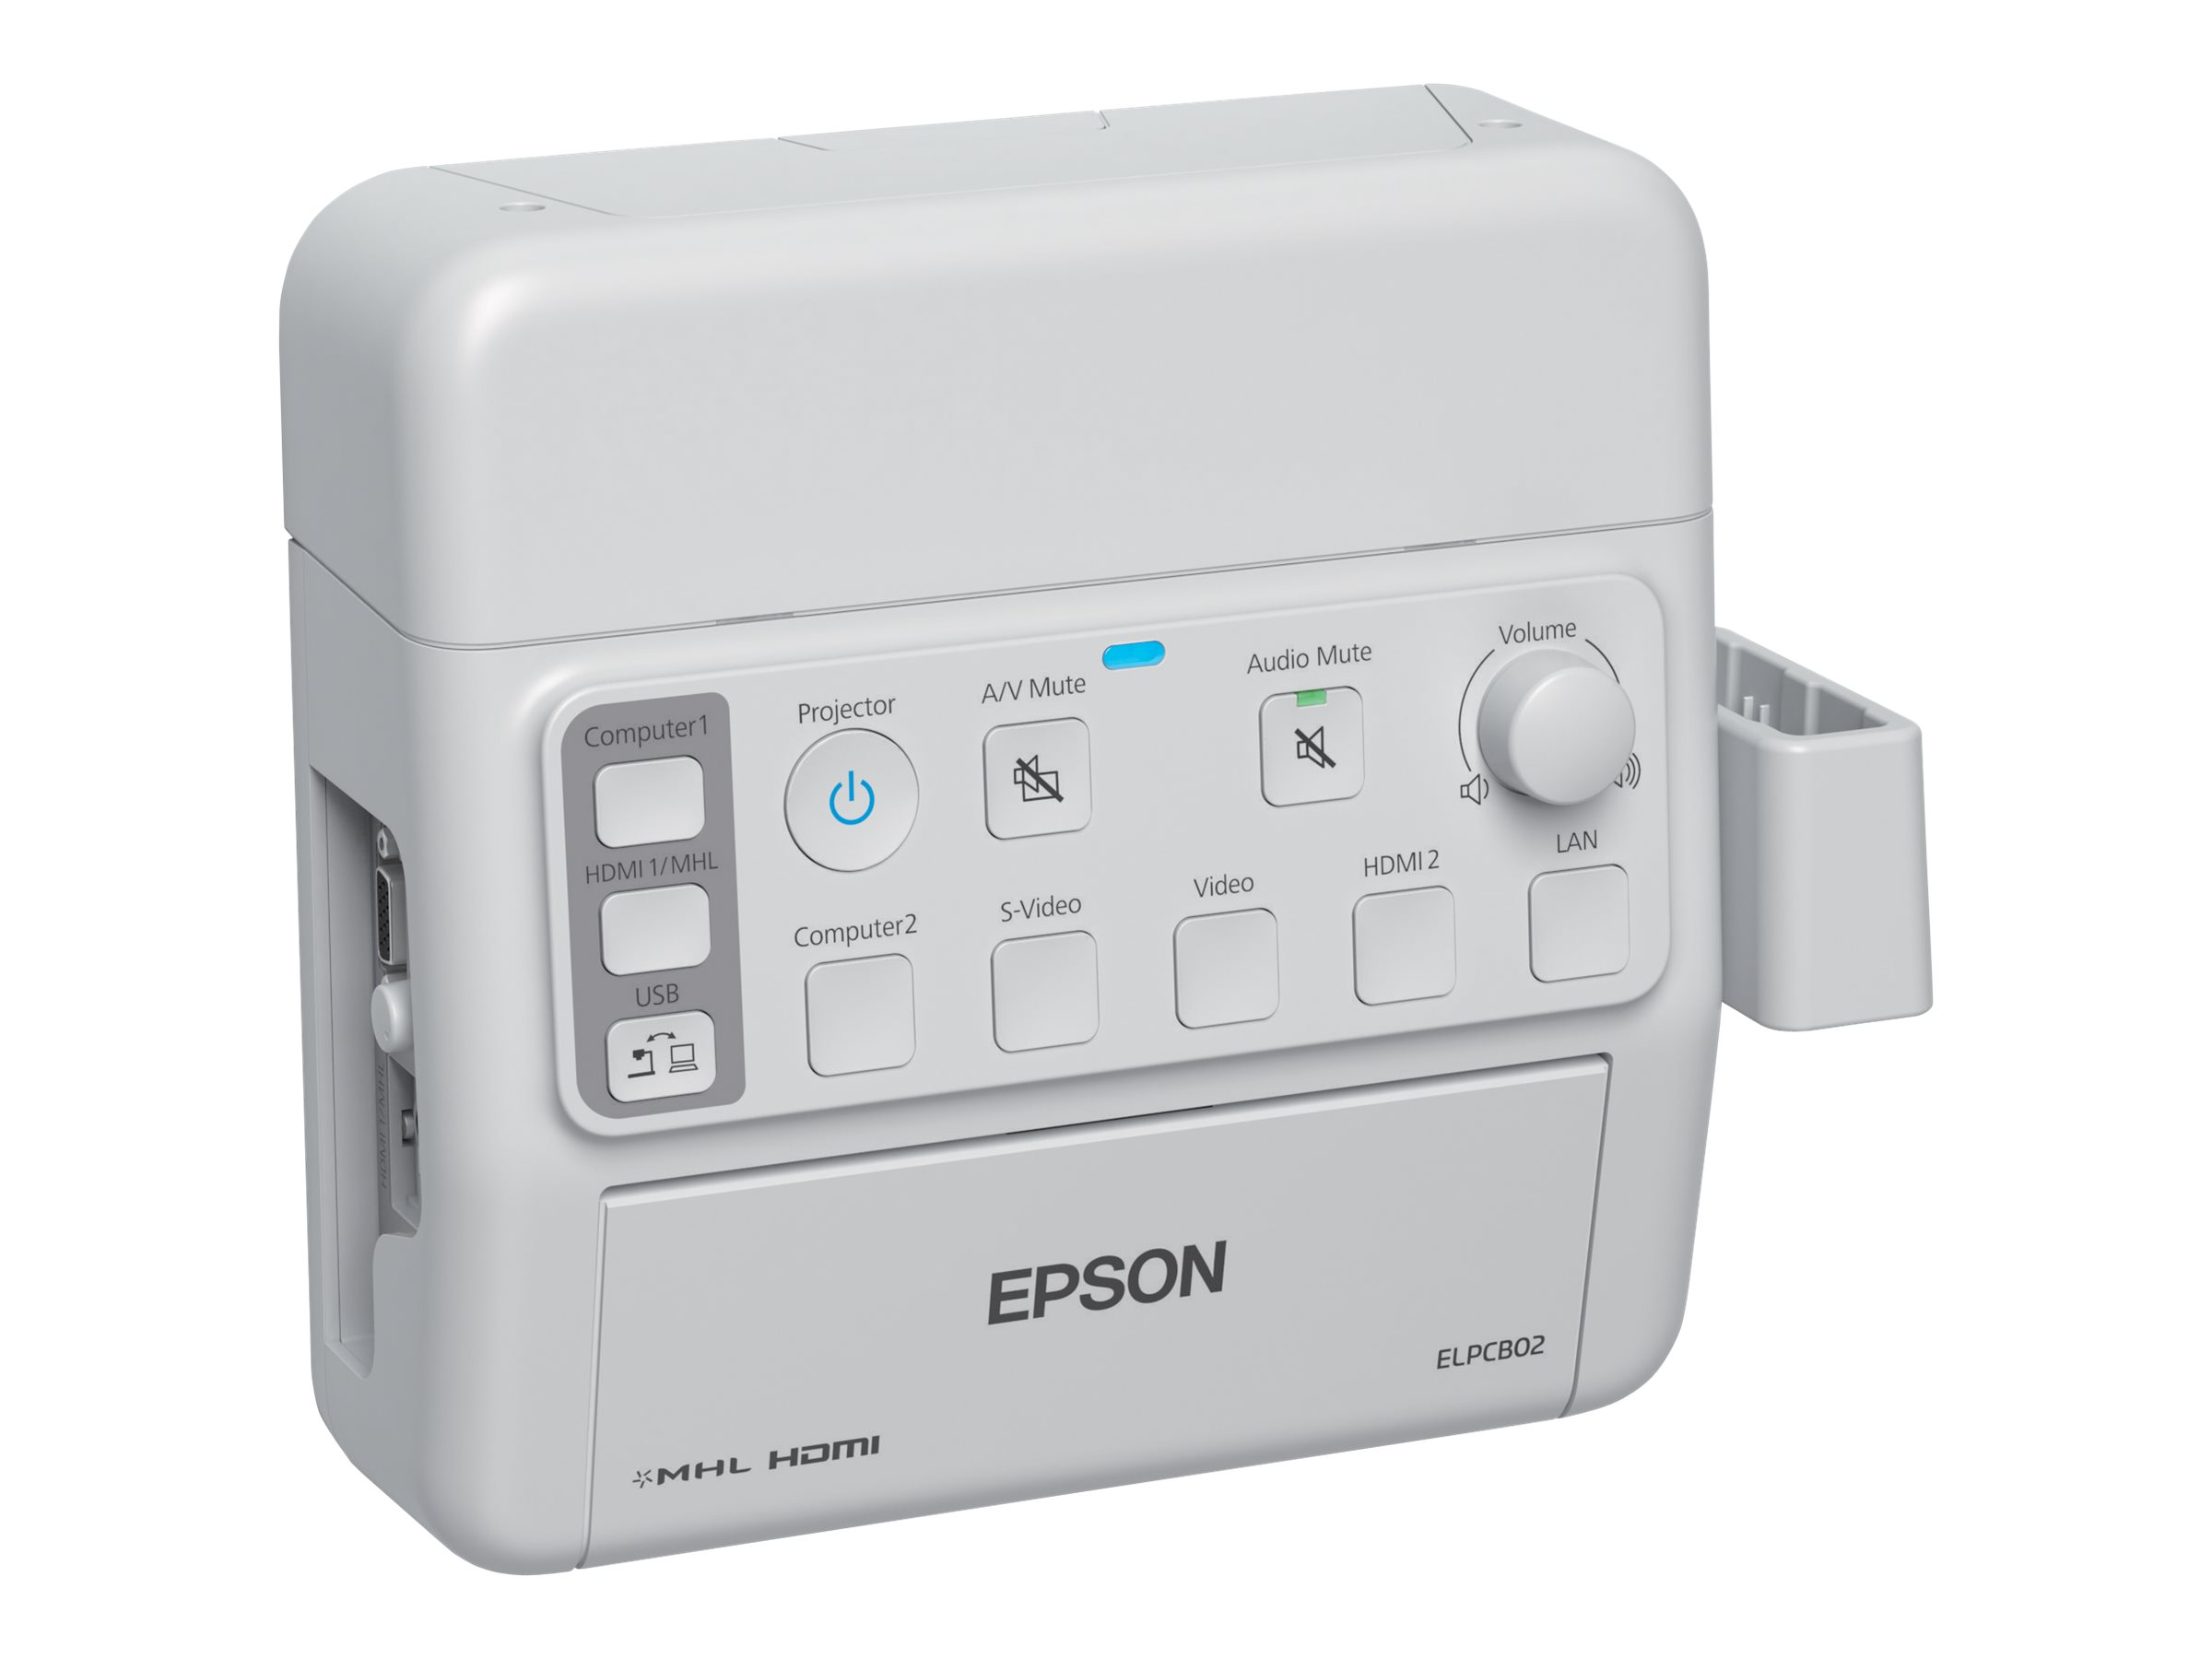 EPSON ELPCB02 CAJA DE CONTROL DEL PROYECTOR PARA E